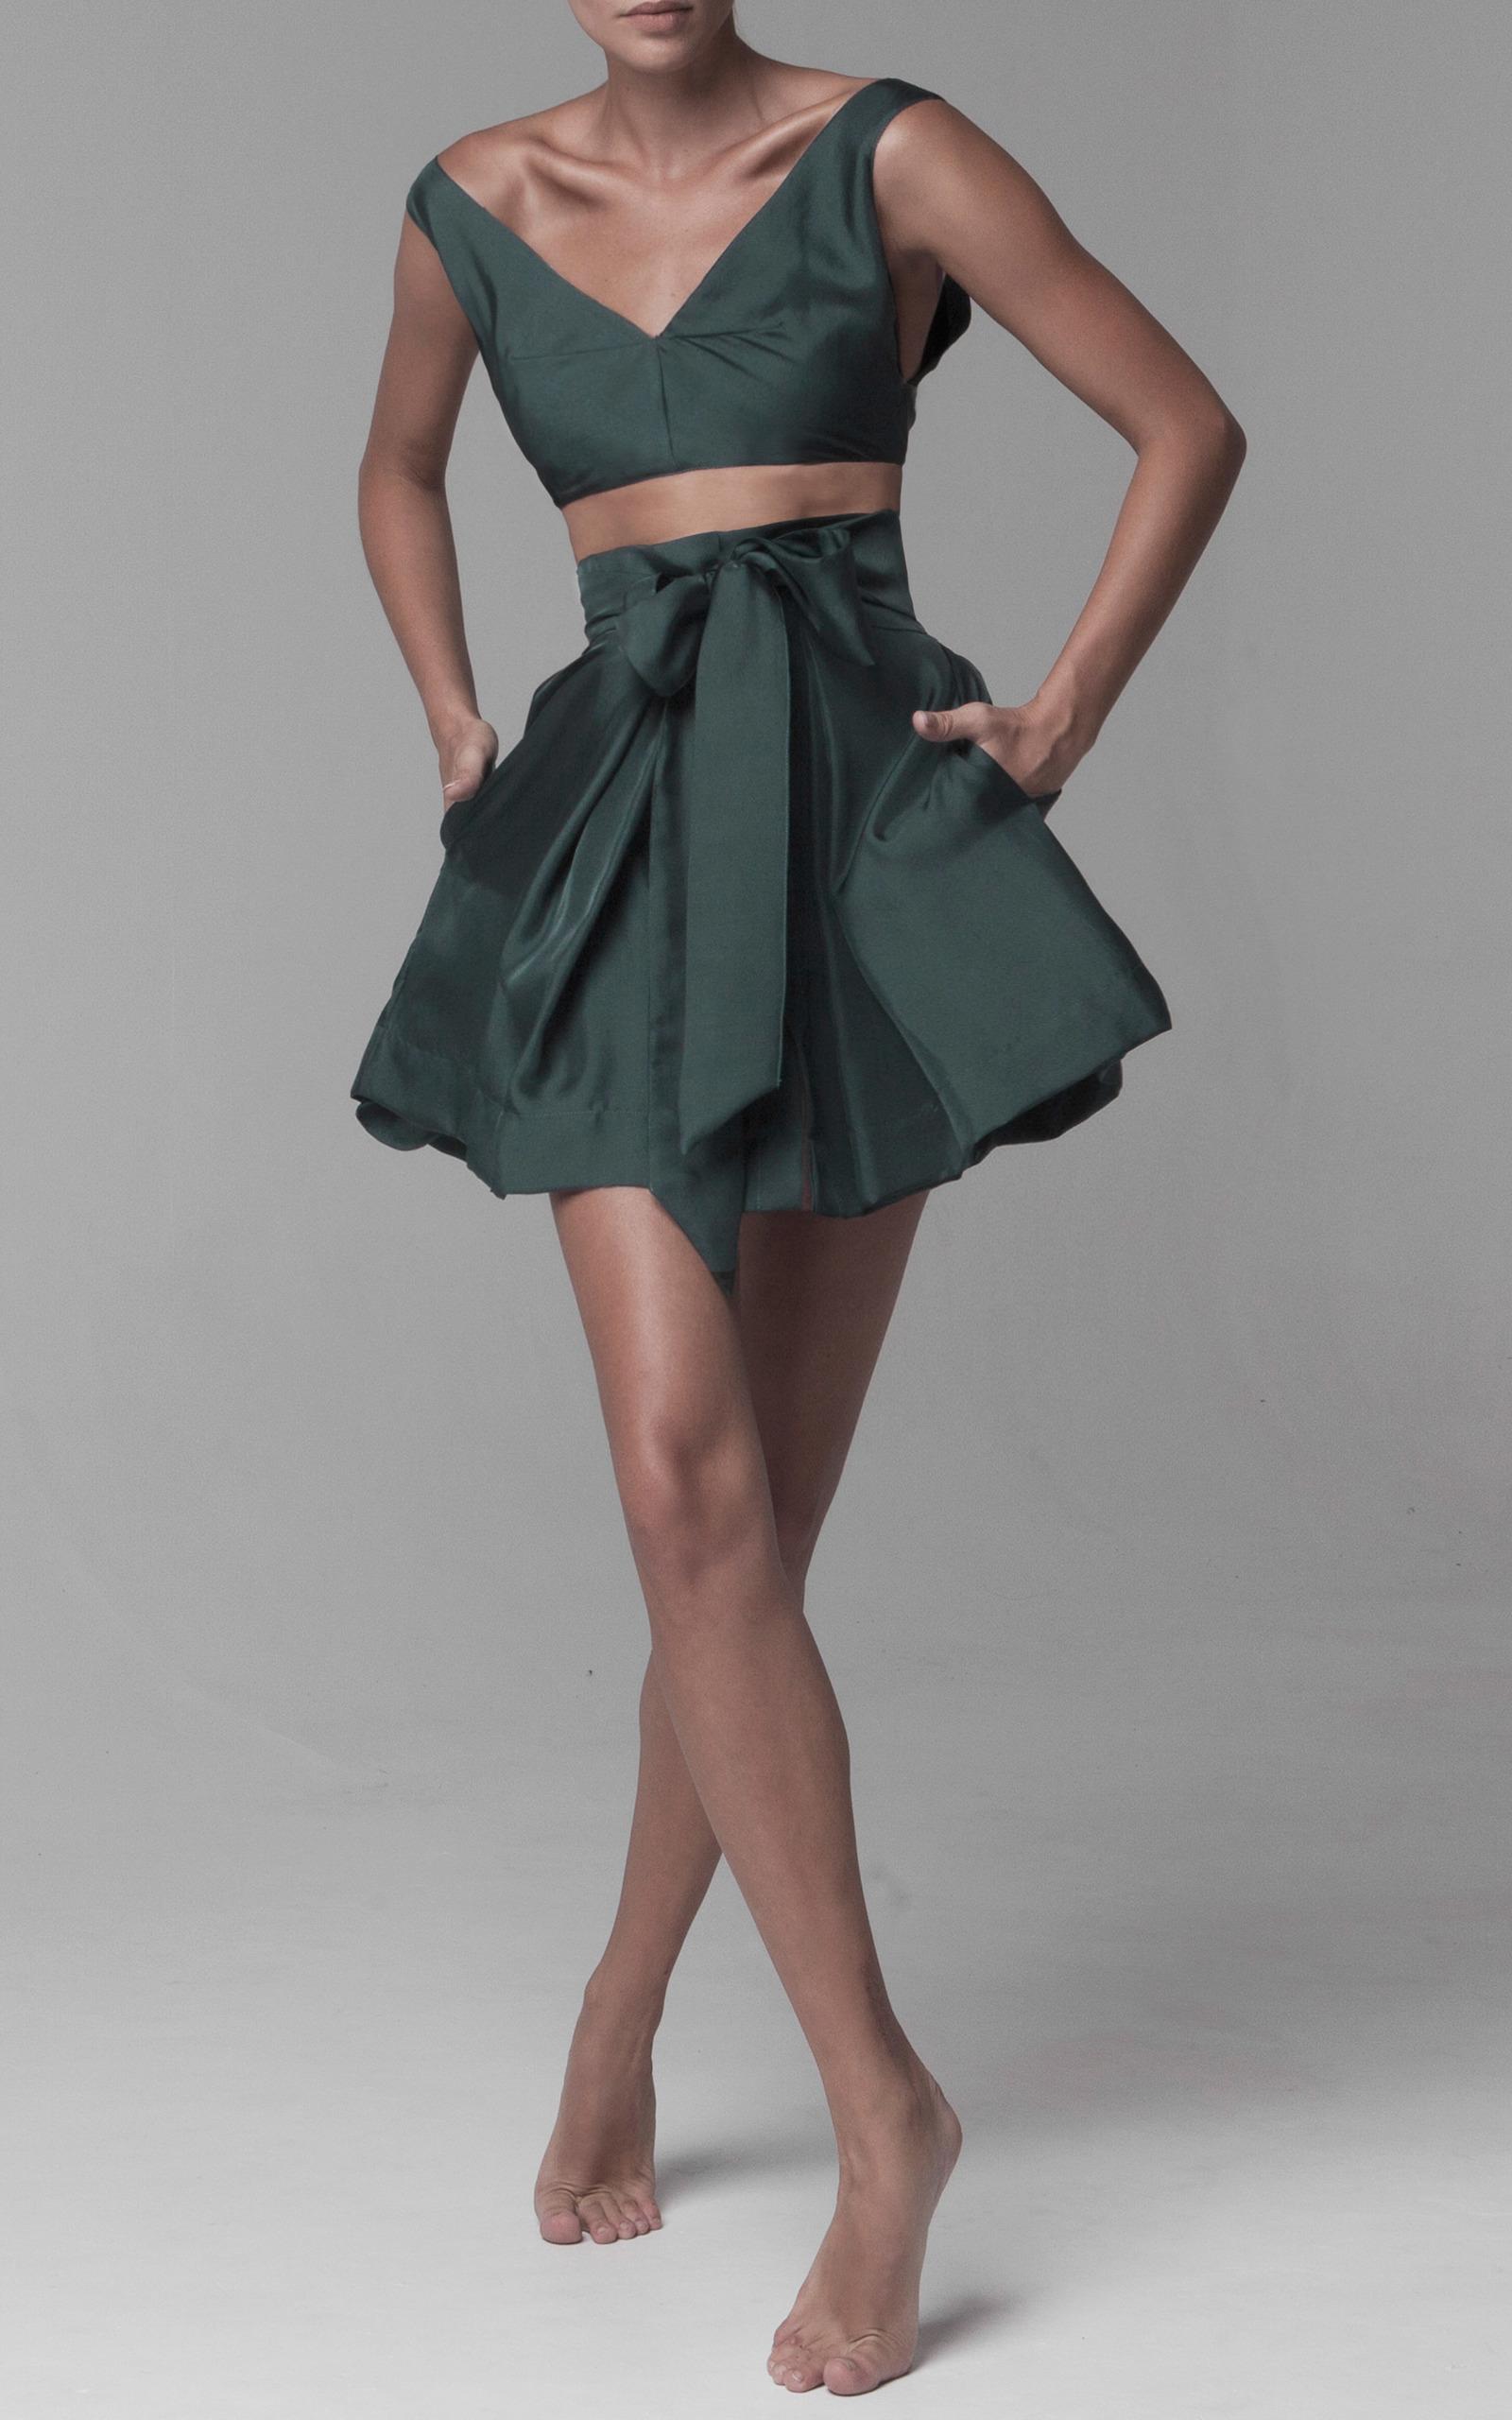 39a17370d Avedon Days Mini Skirt by Kalita | Moda Operandi